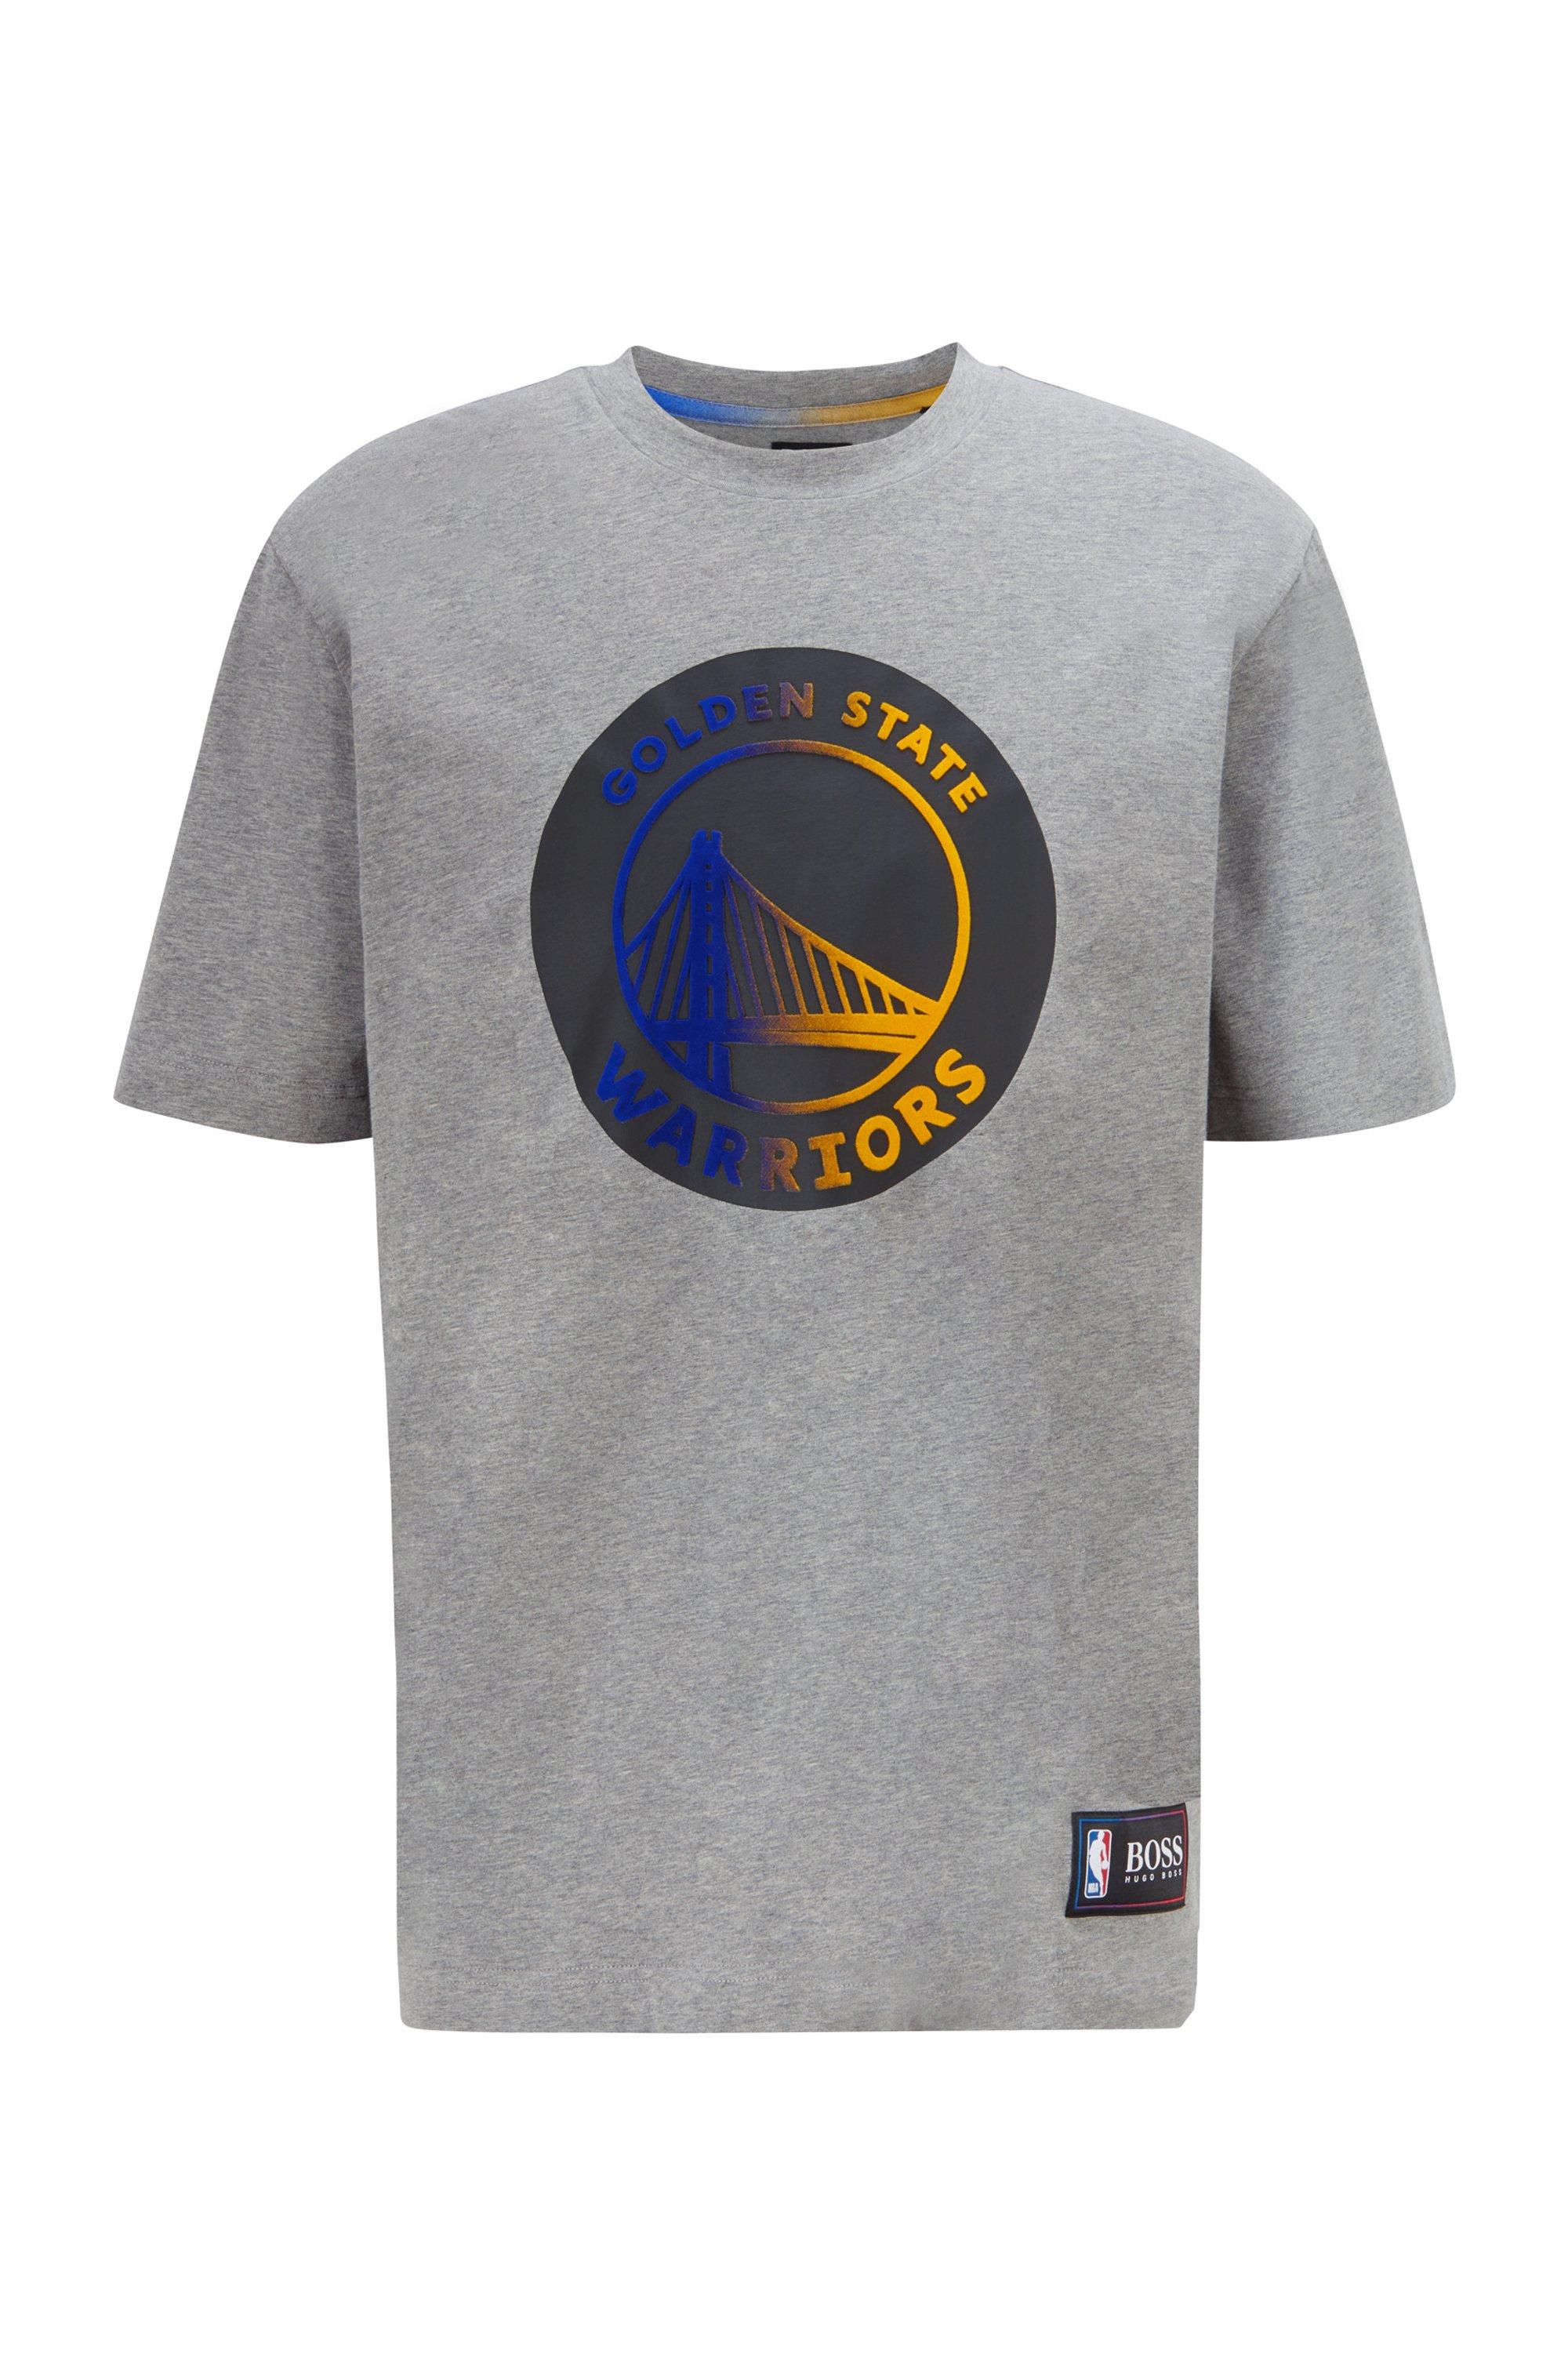 BOSS x NBA T-shirt with team logo, Silver